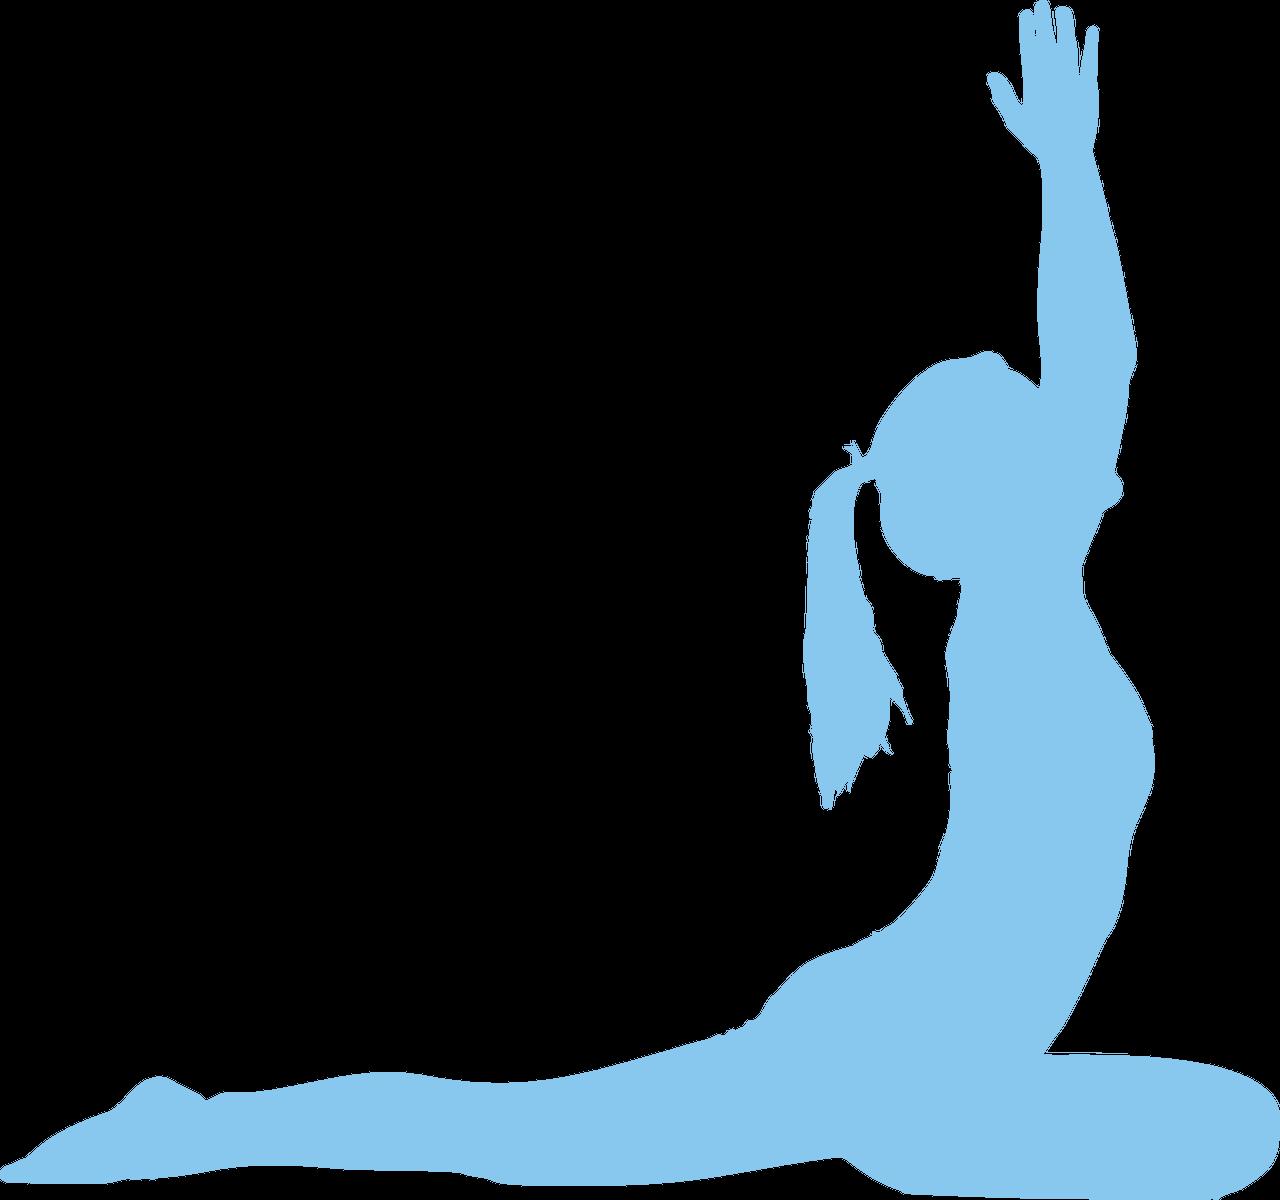 Asana Vector graphics Yoga Silhouette Posture.